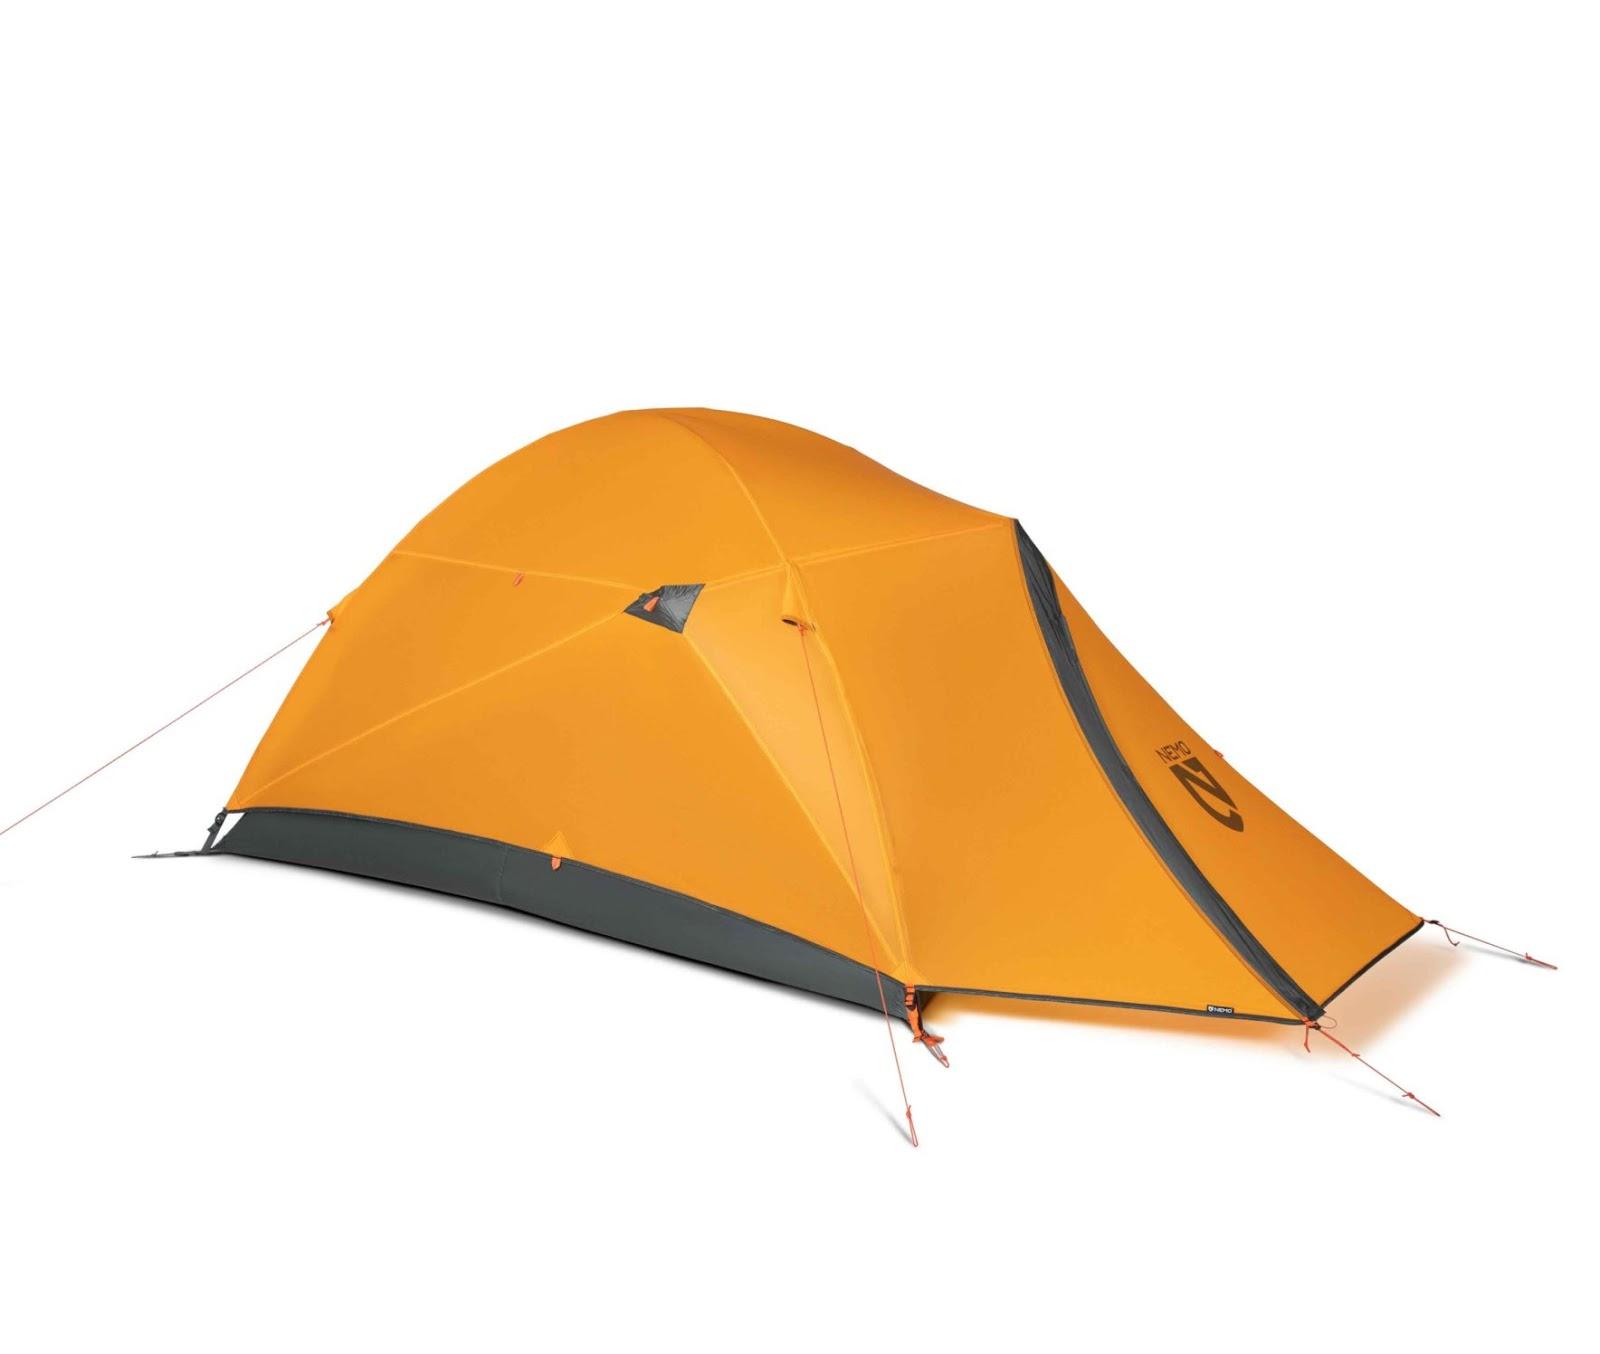 stock photo of the nemo kunai 2p tent